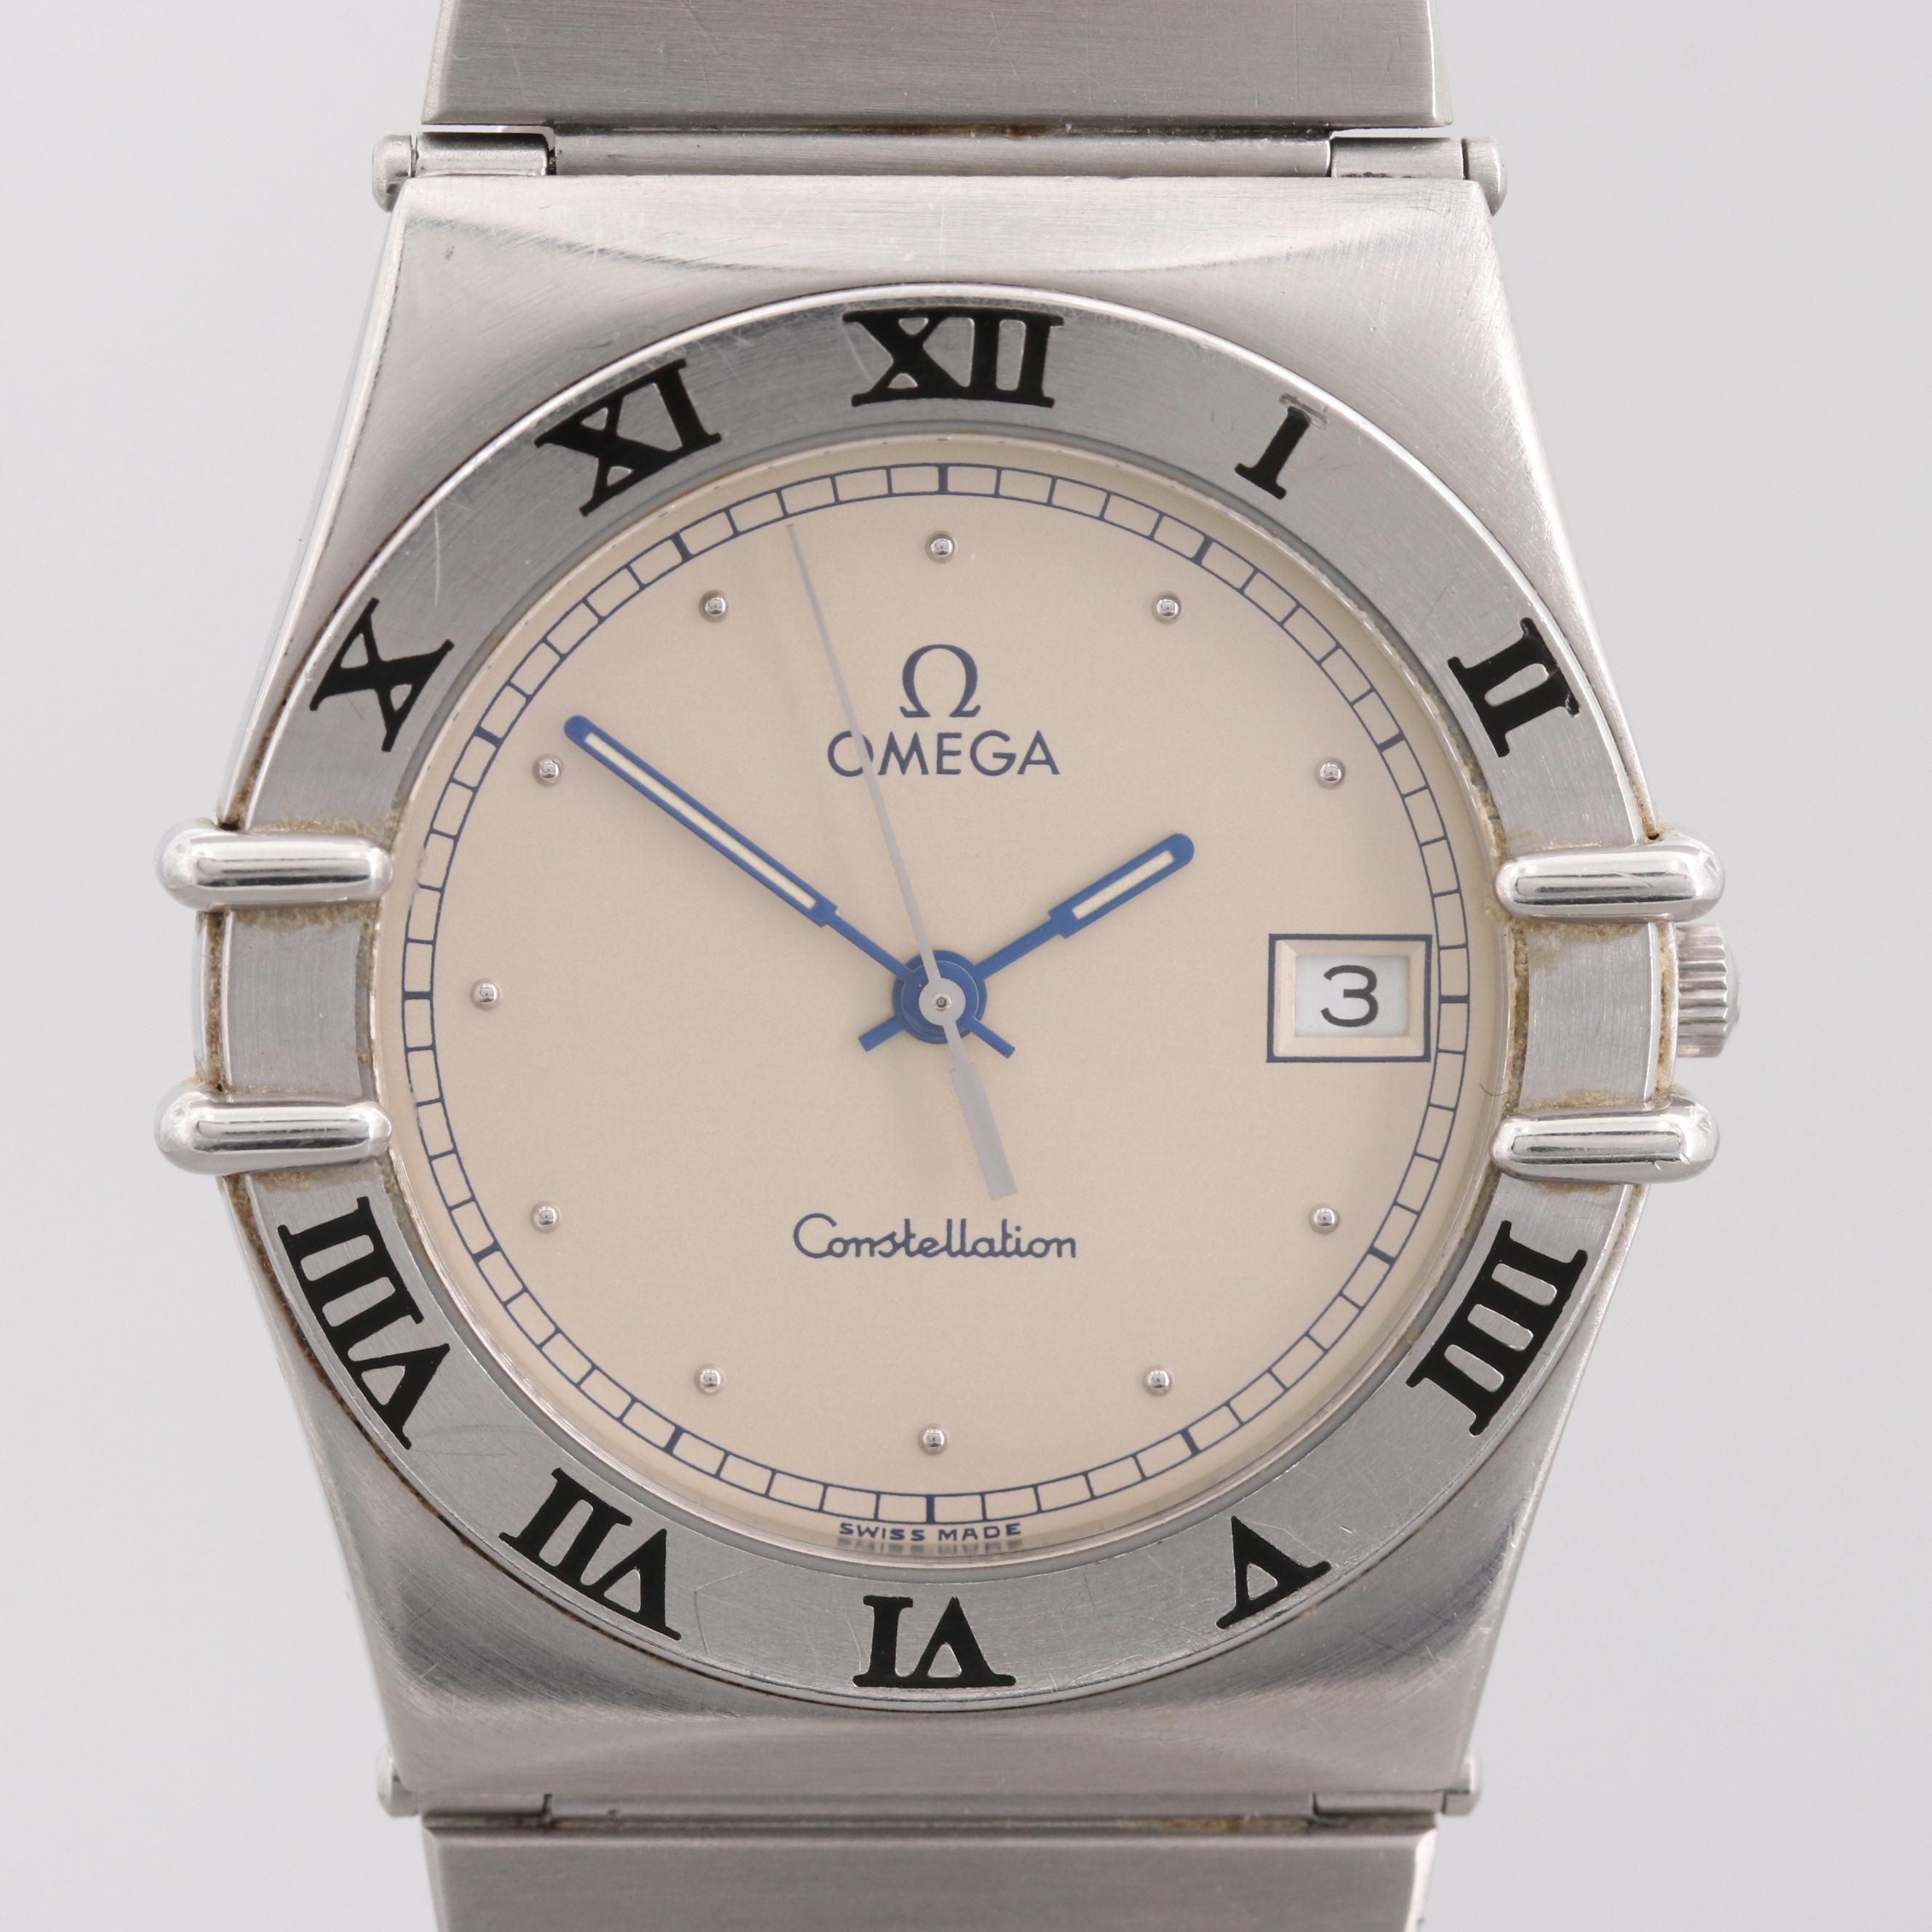 Omega Constellation Quartz Wristwatch With Date Window